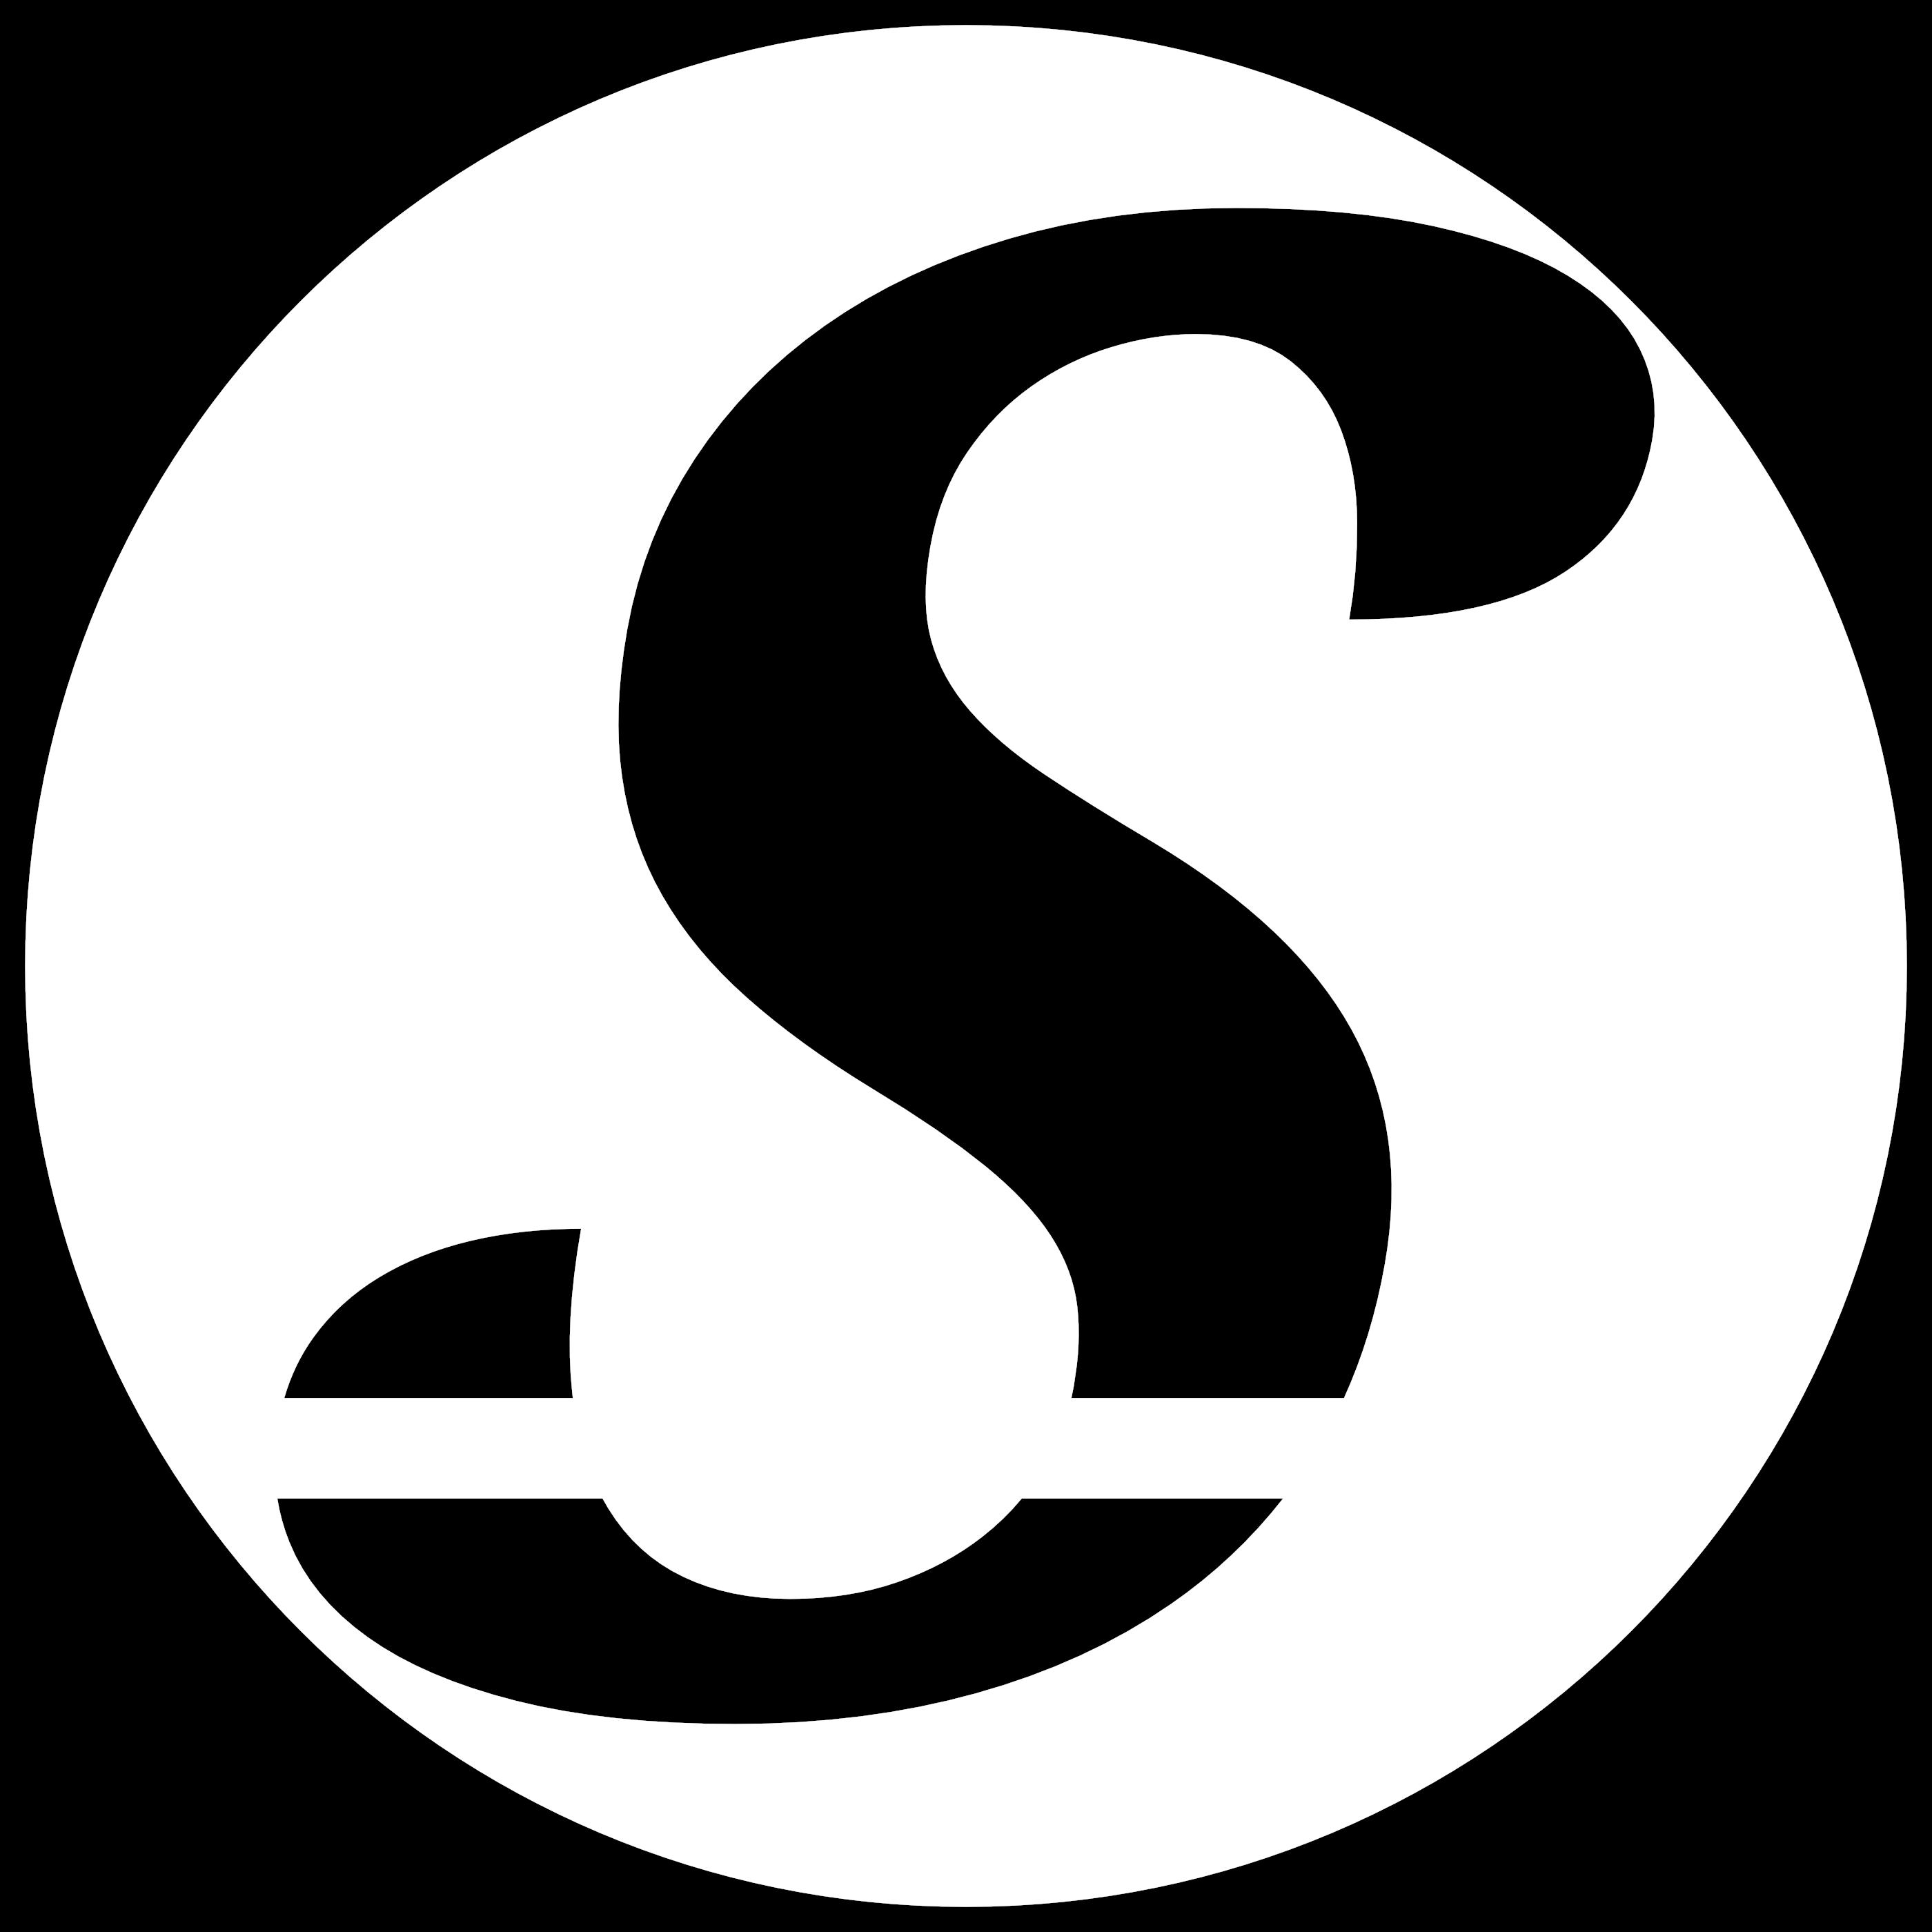 "Sheekore ""S"" monochrome black logo."